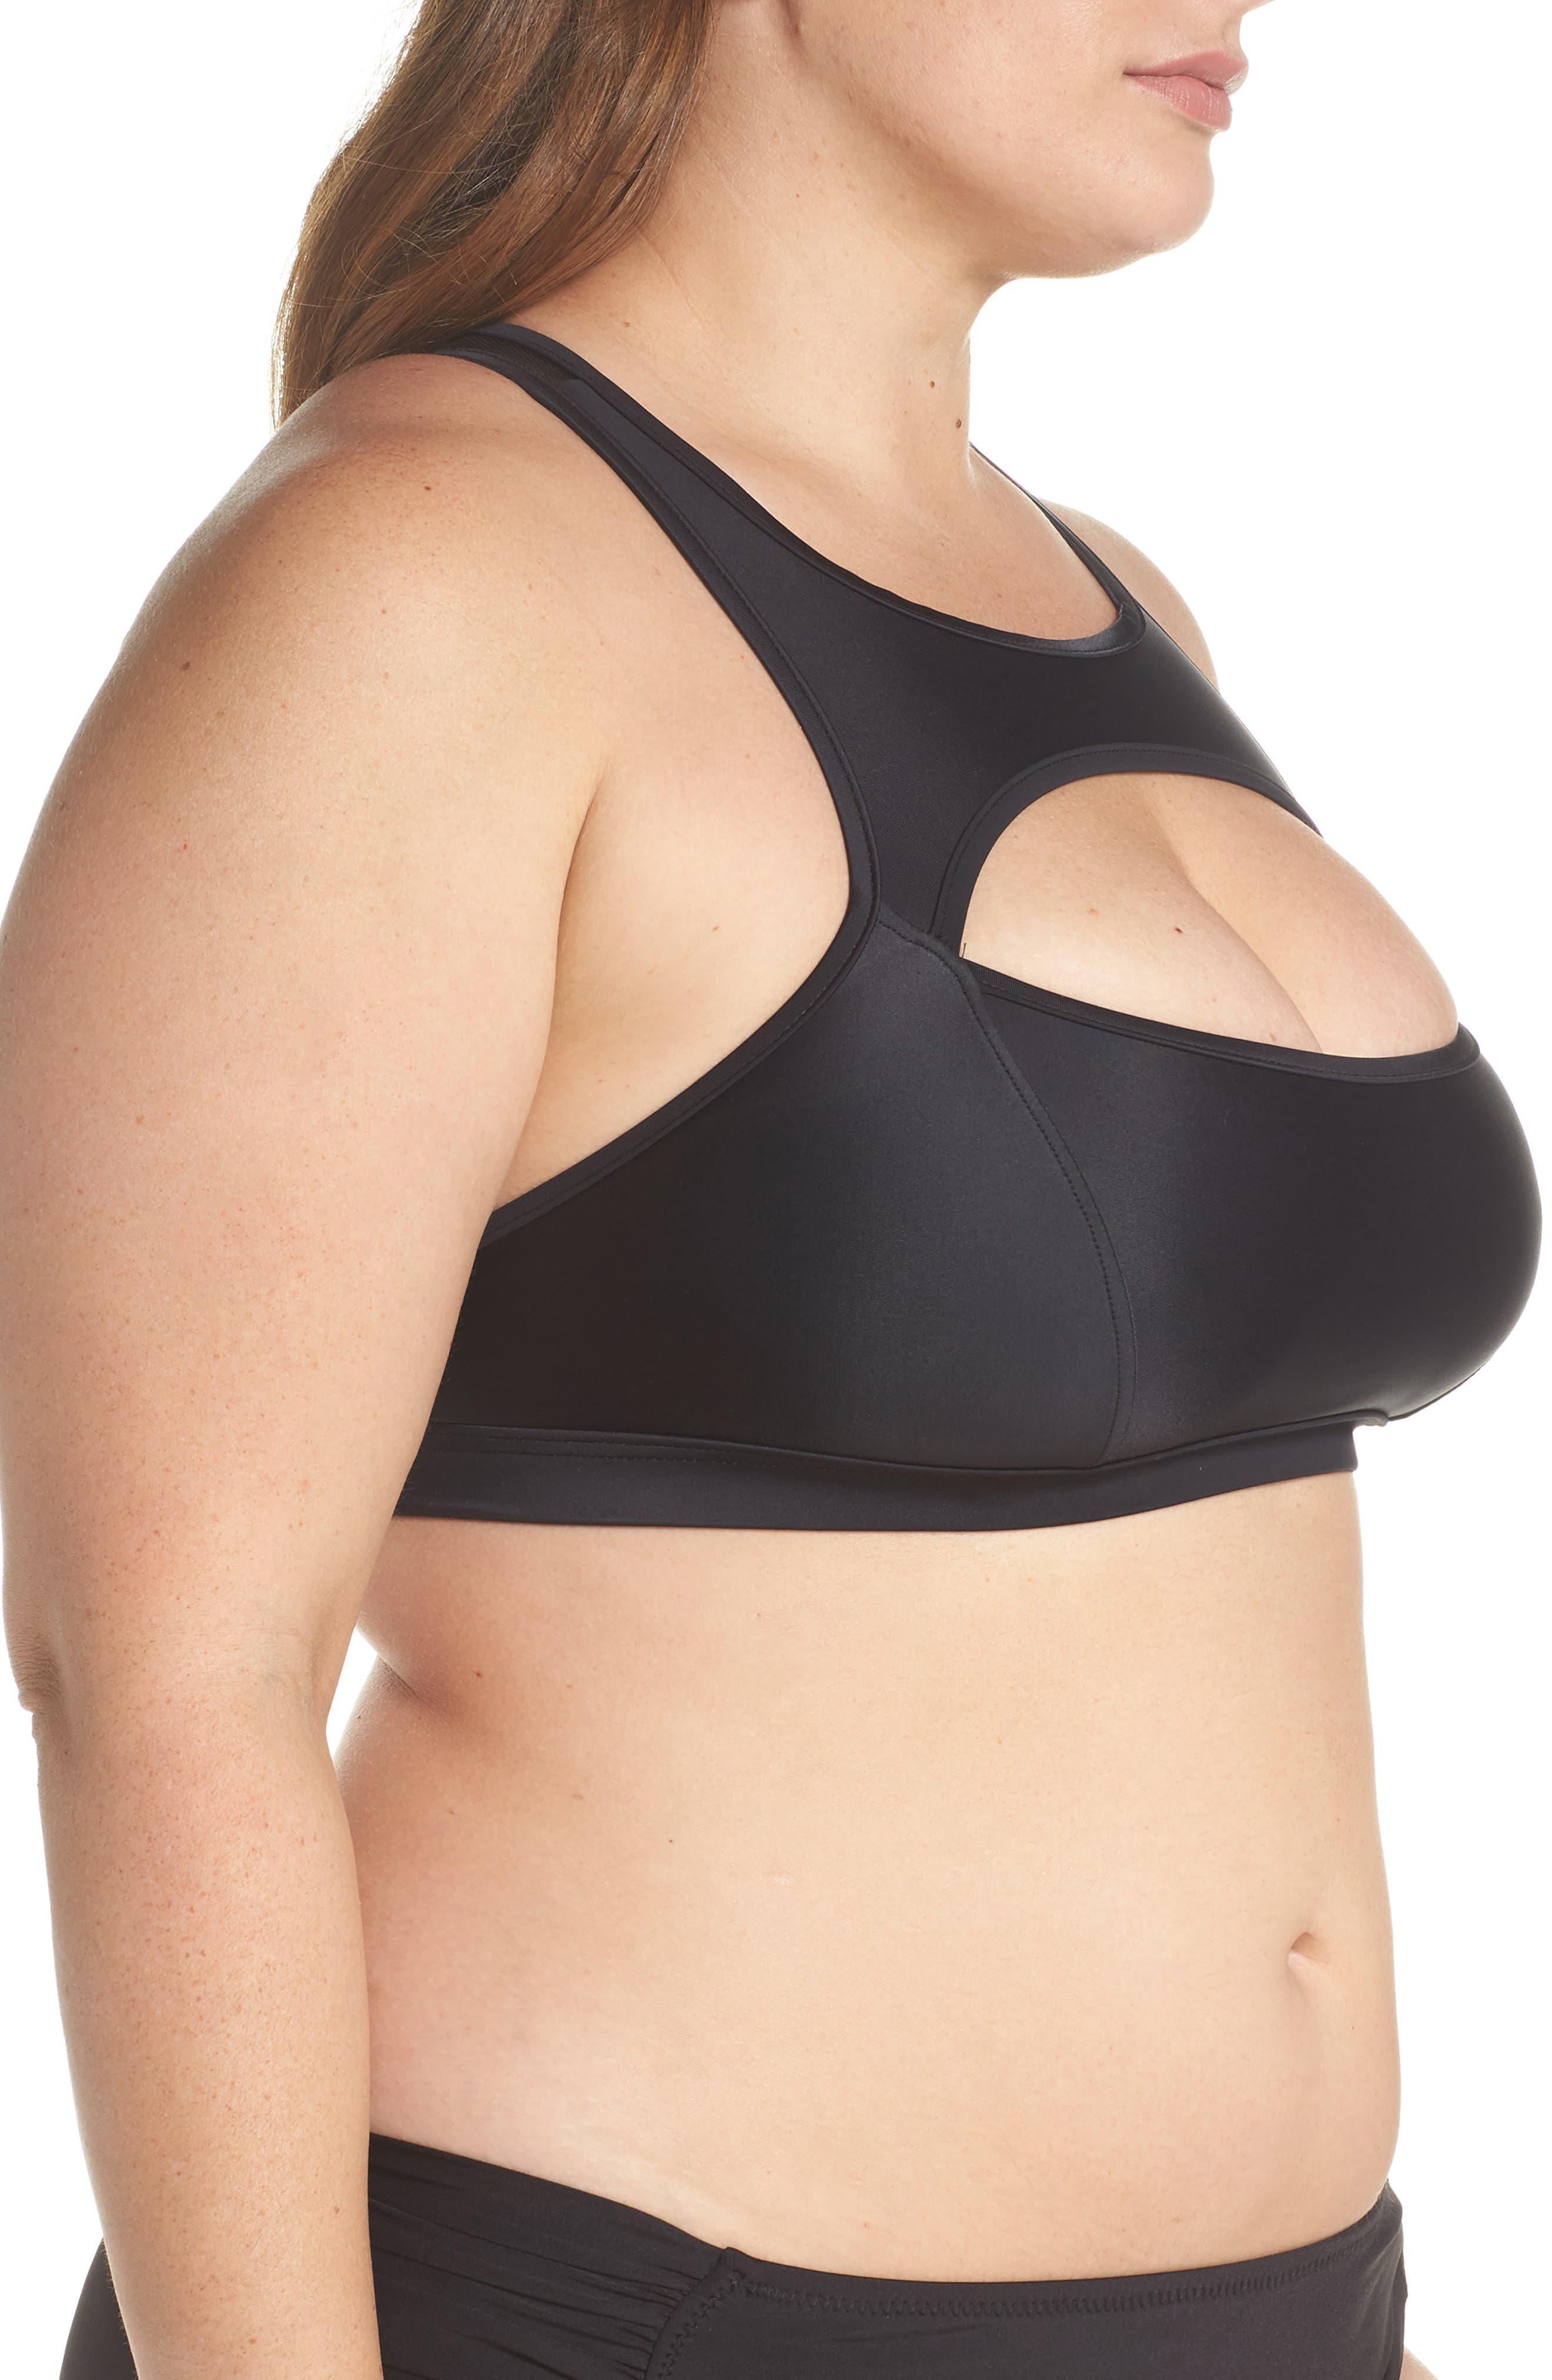 Saldana Cutout Bikini Top,                             Alternate thumbnail 3, color,                             Black